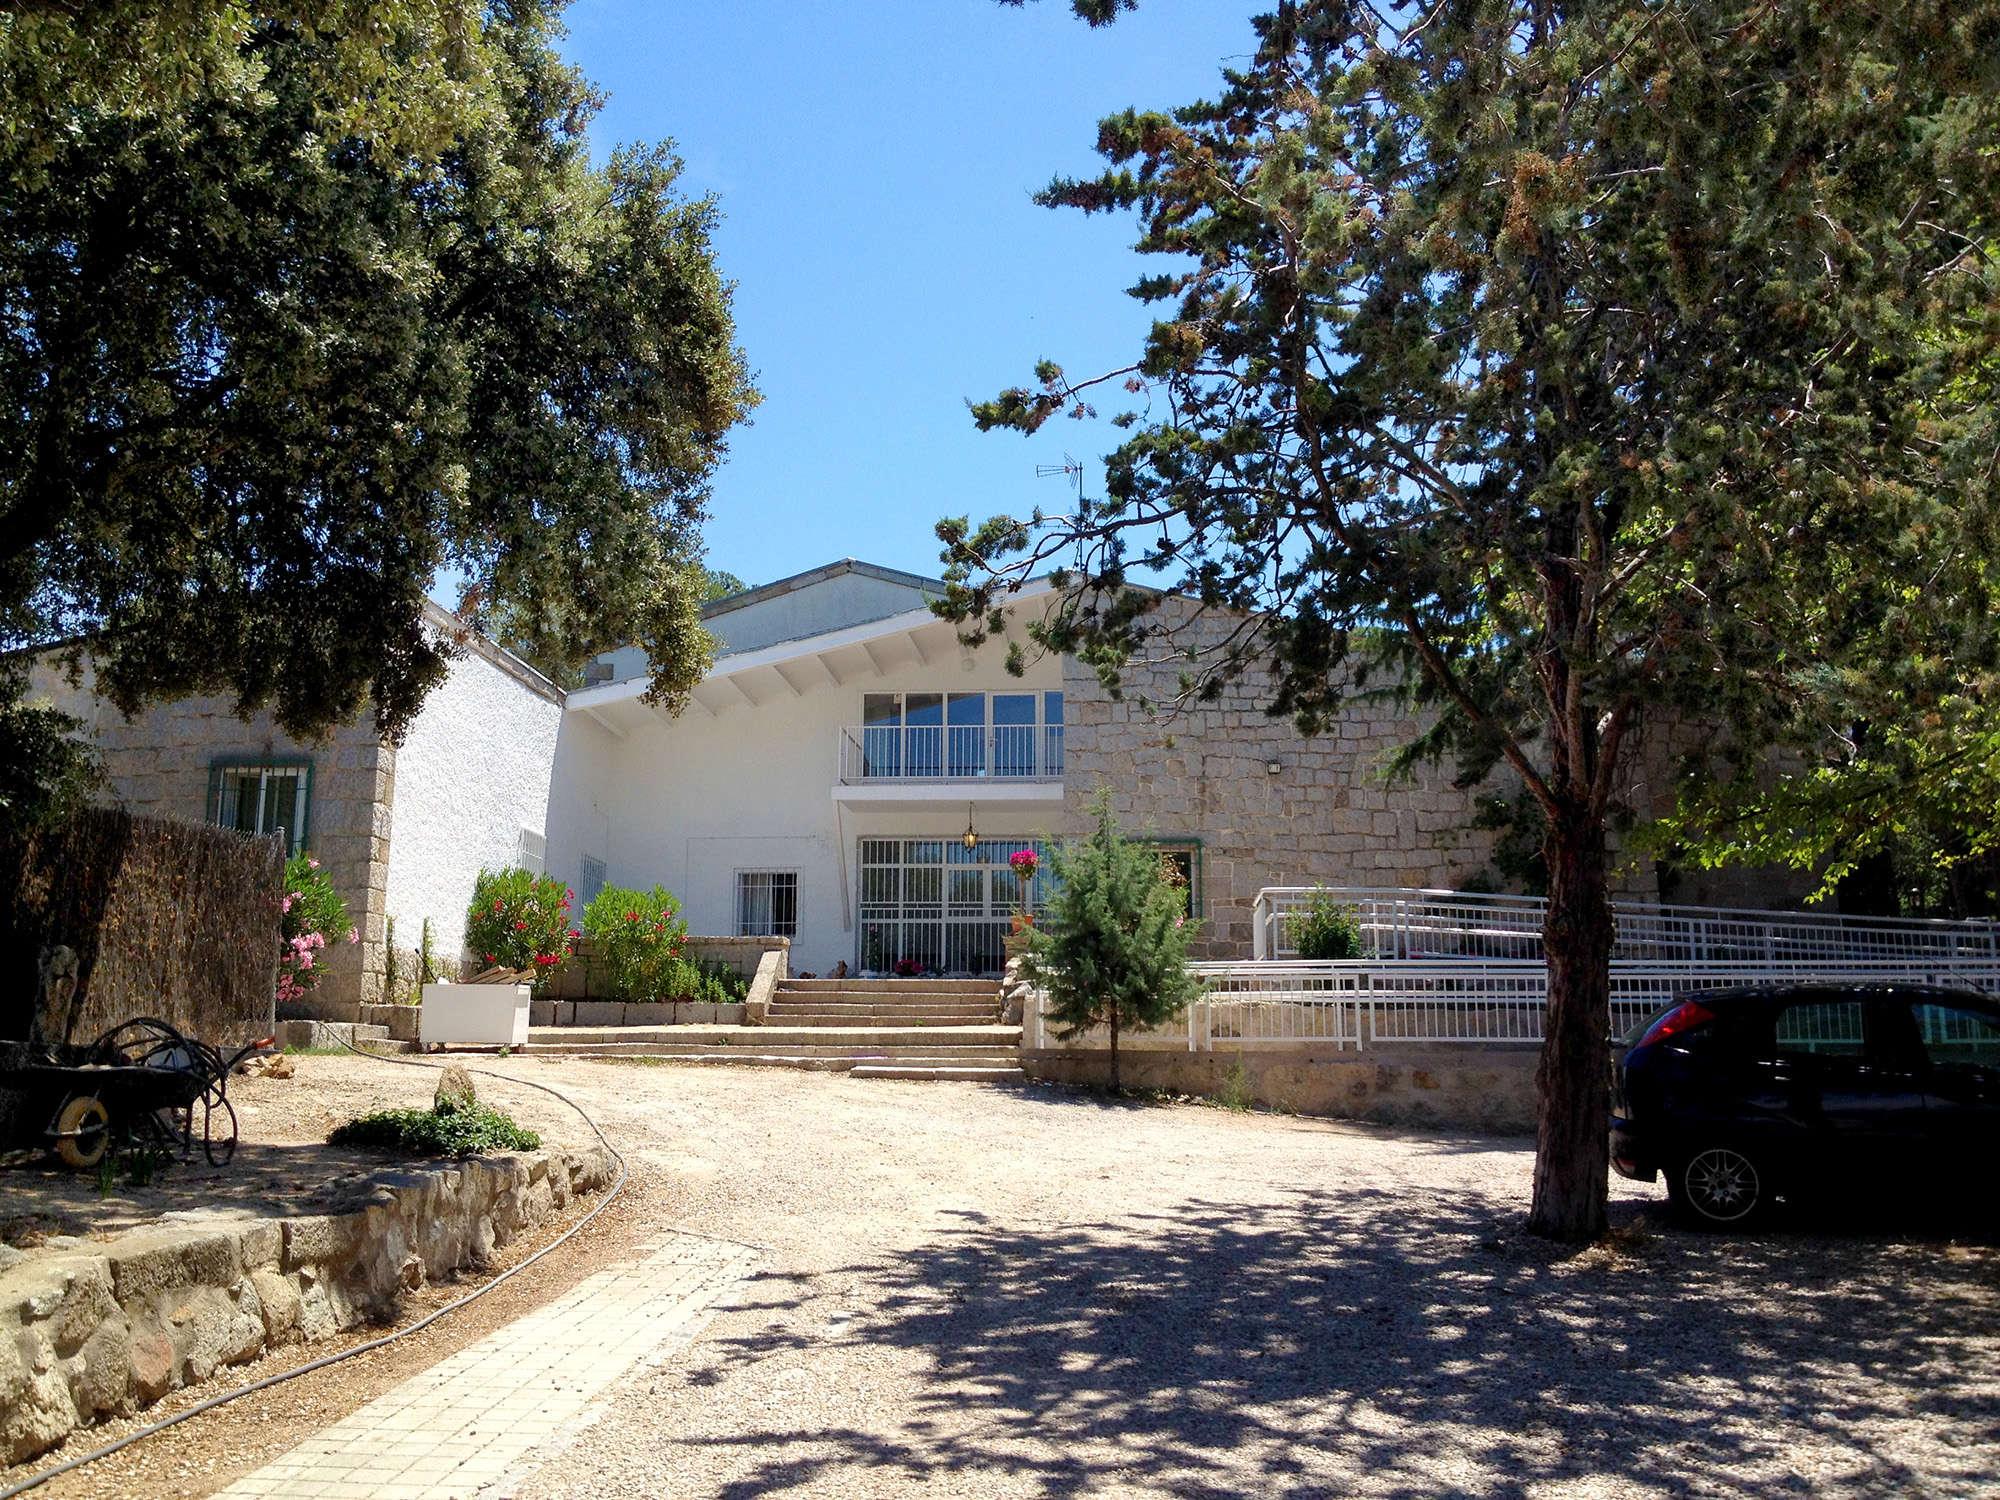 Betel Women's Residence in Torrelodones, Madrid